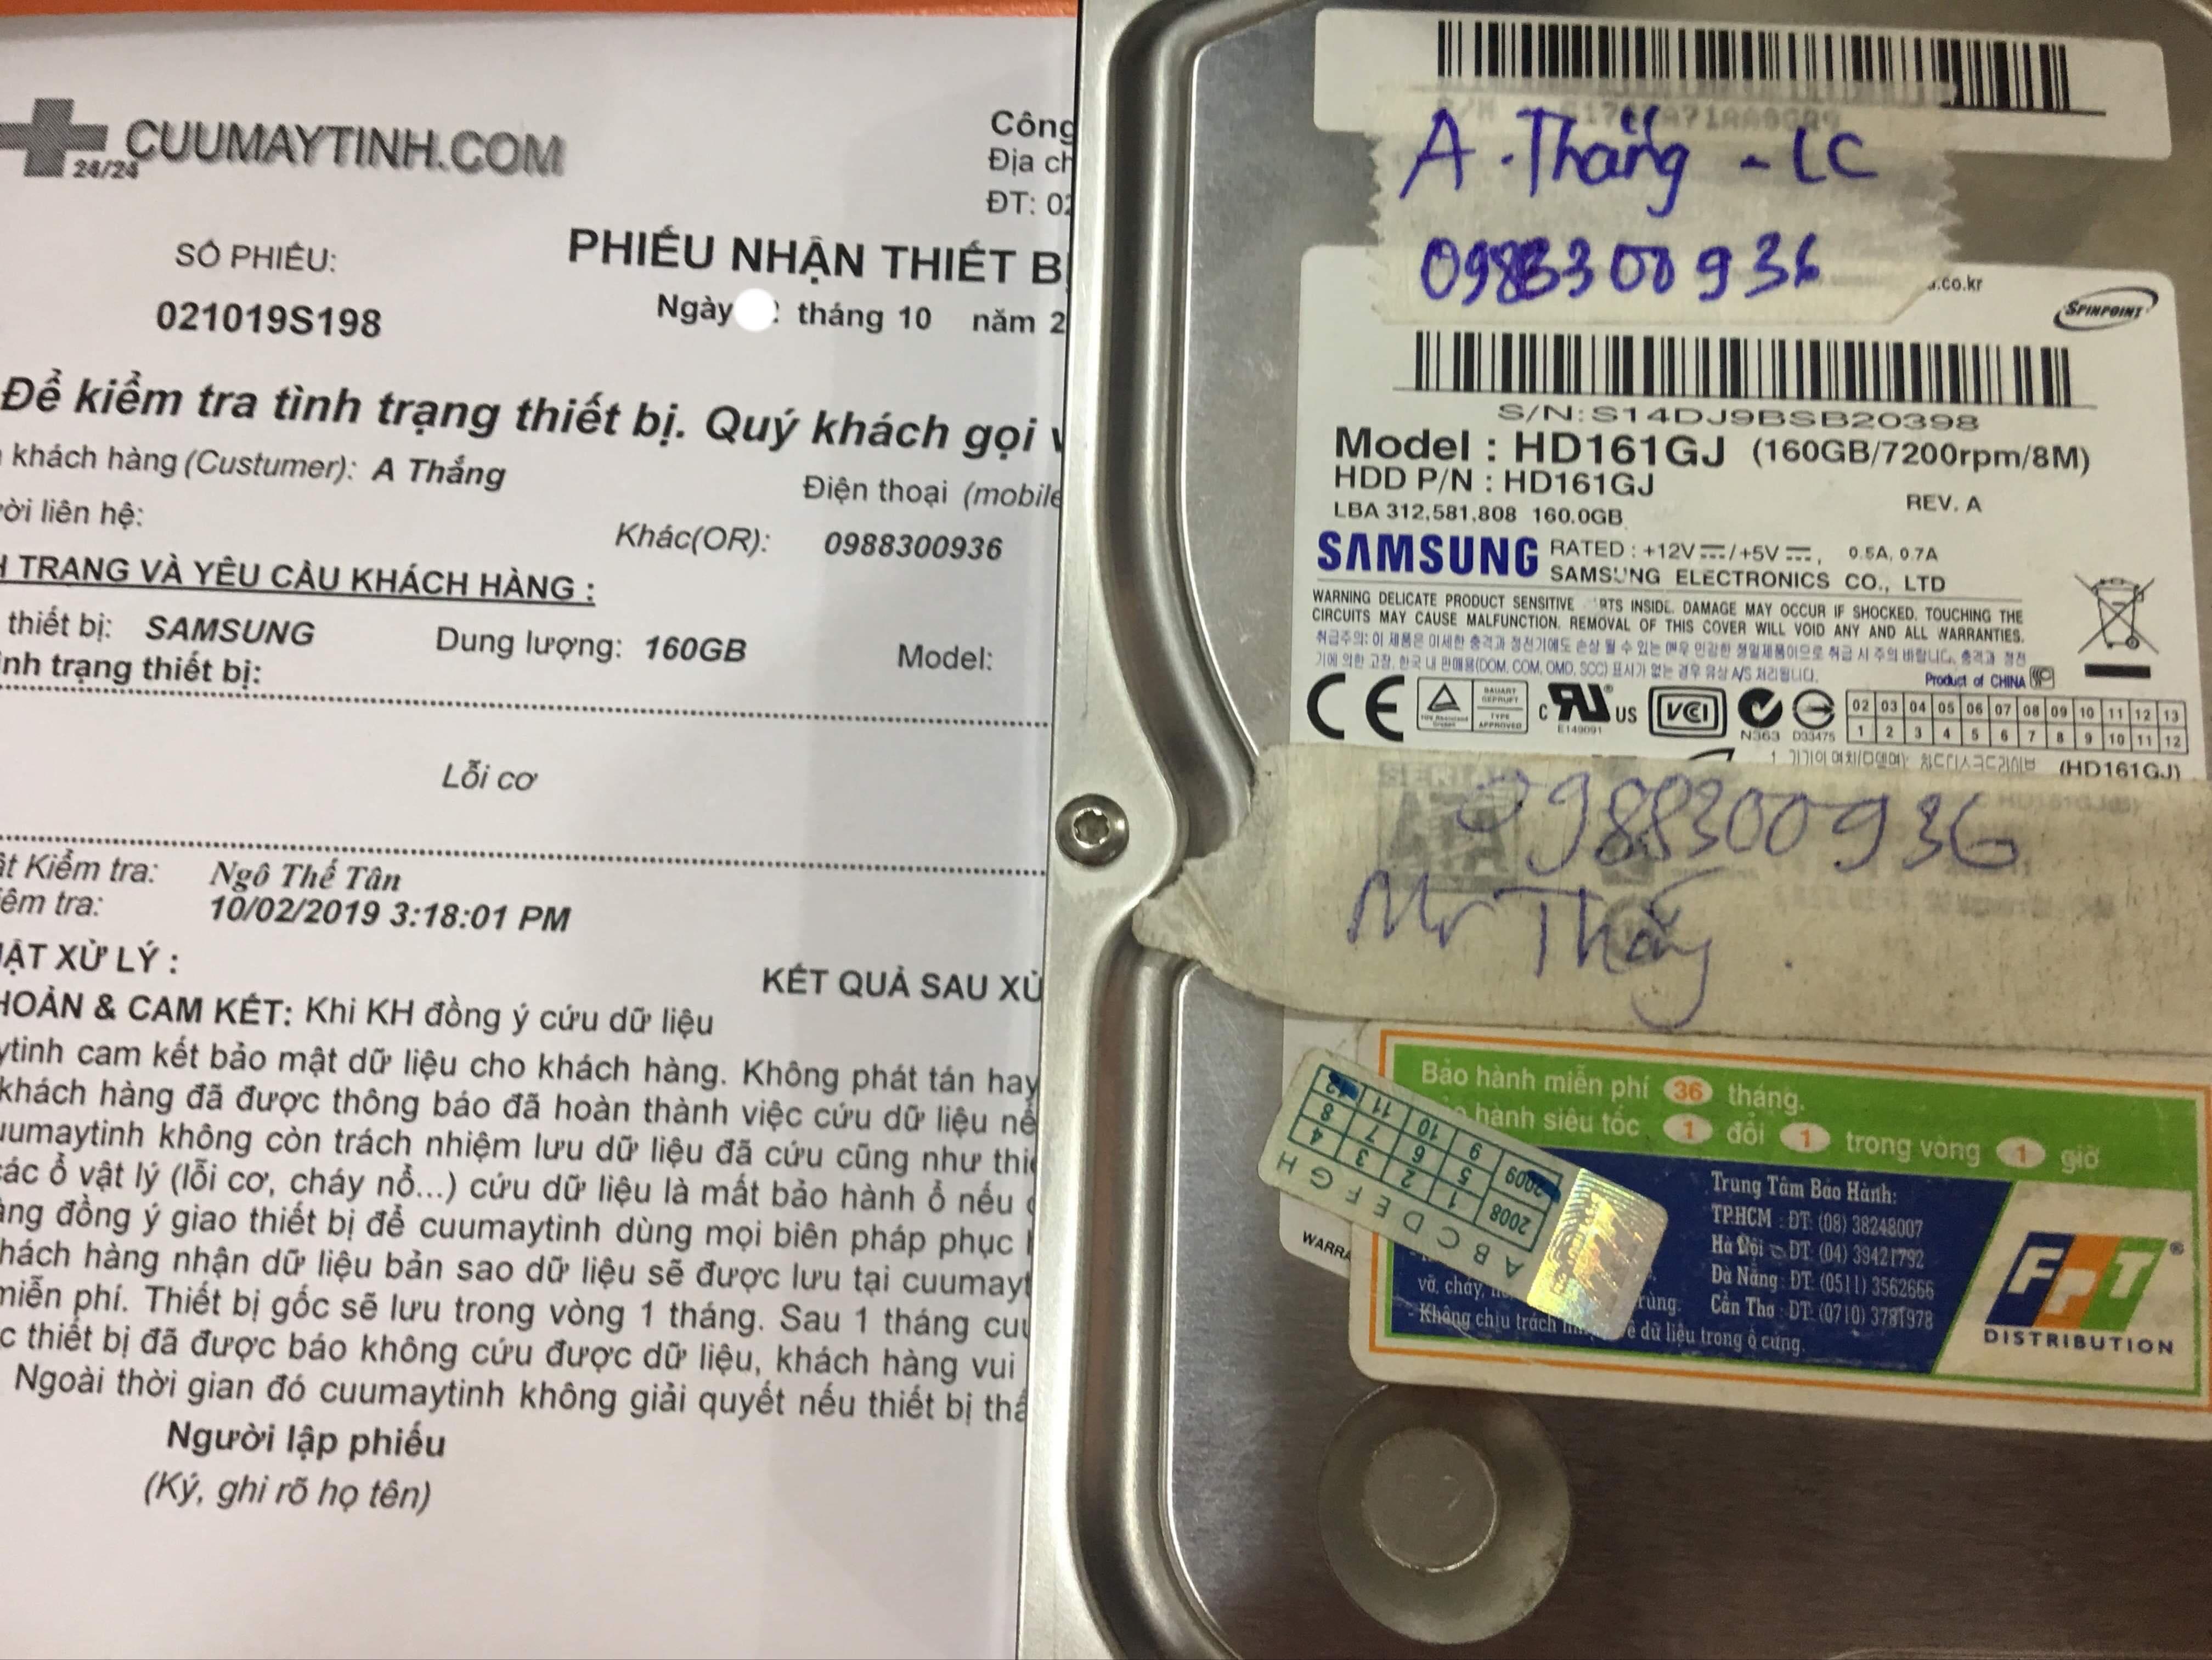 Lấy dữ liệu ổ cứng Samsung 160GB lỗi cơ 26/10/2019 - cuumaytinh